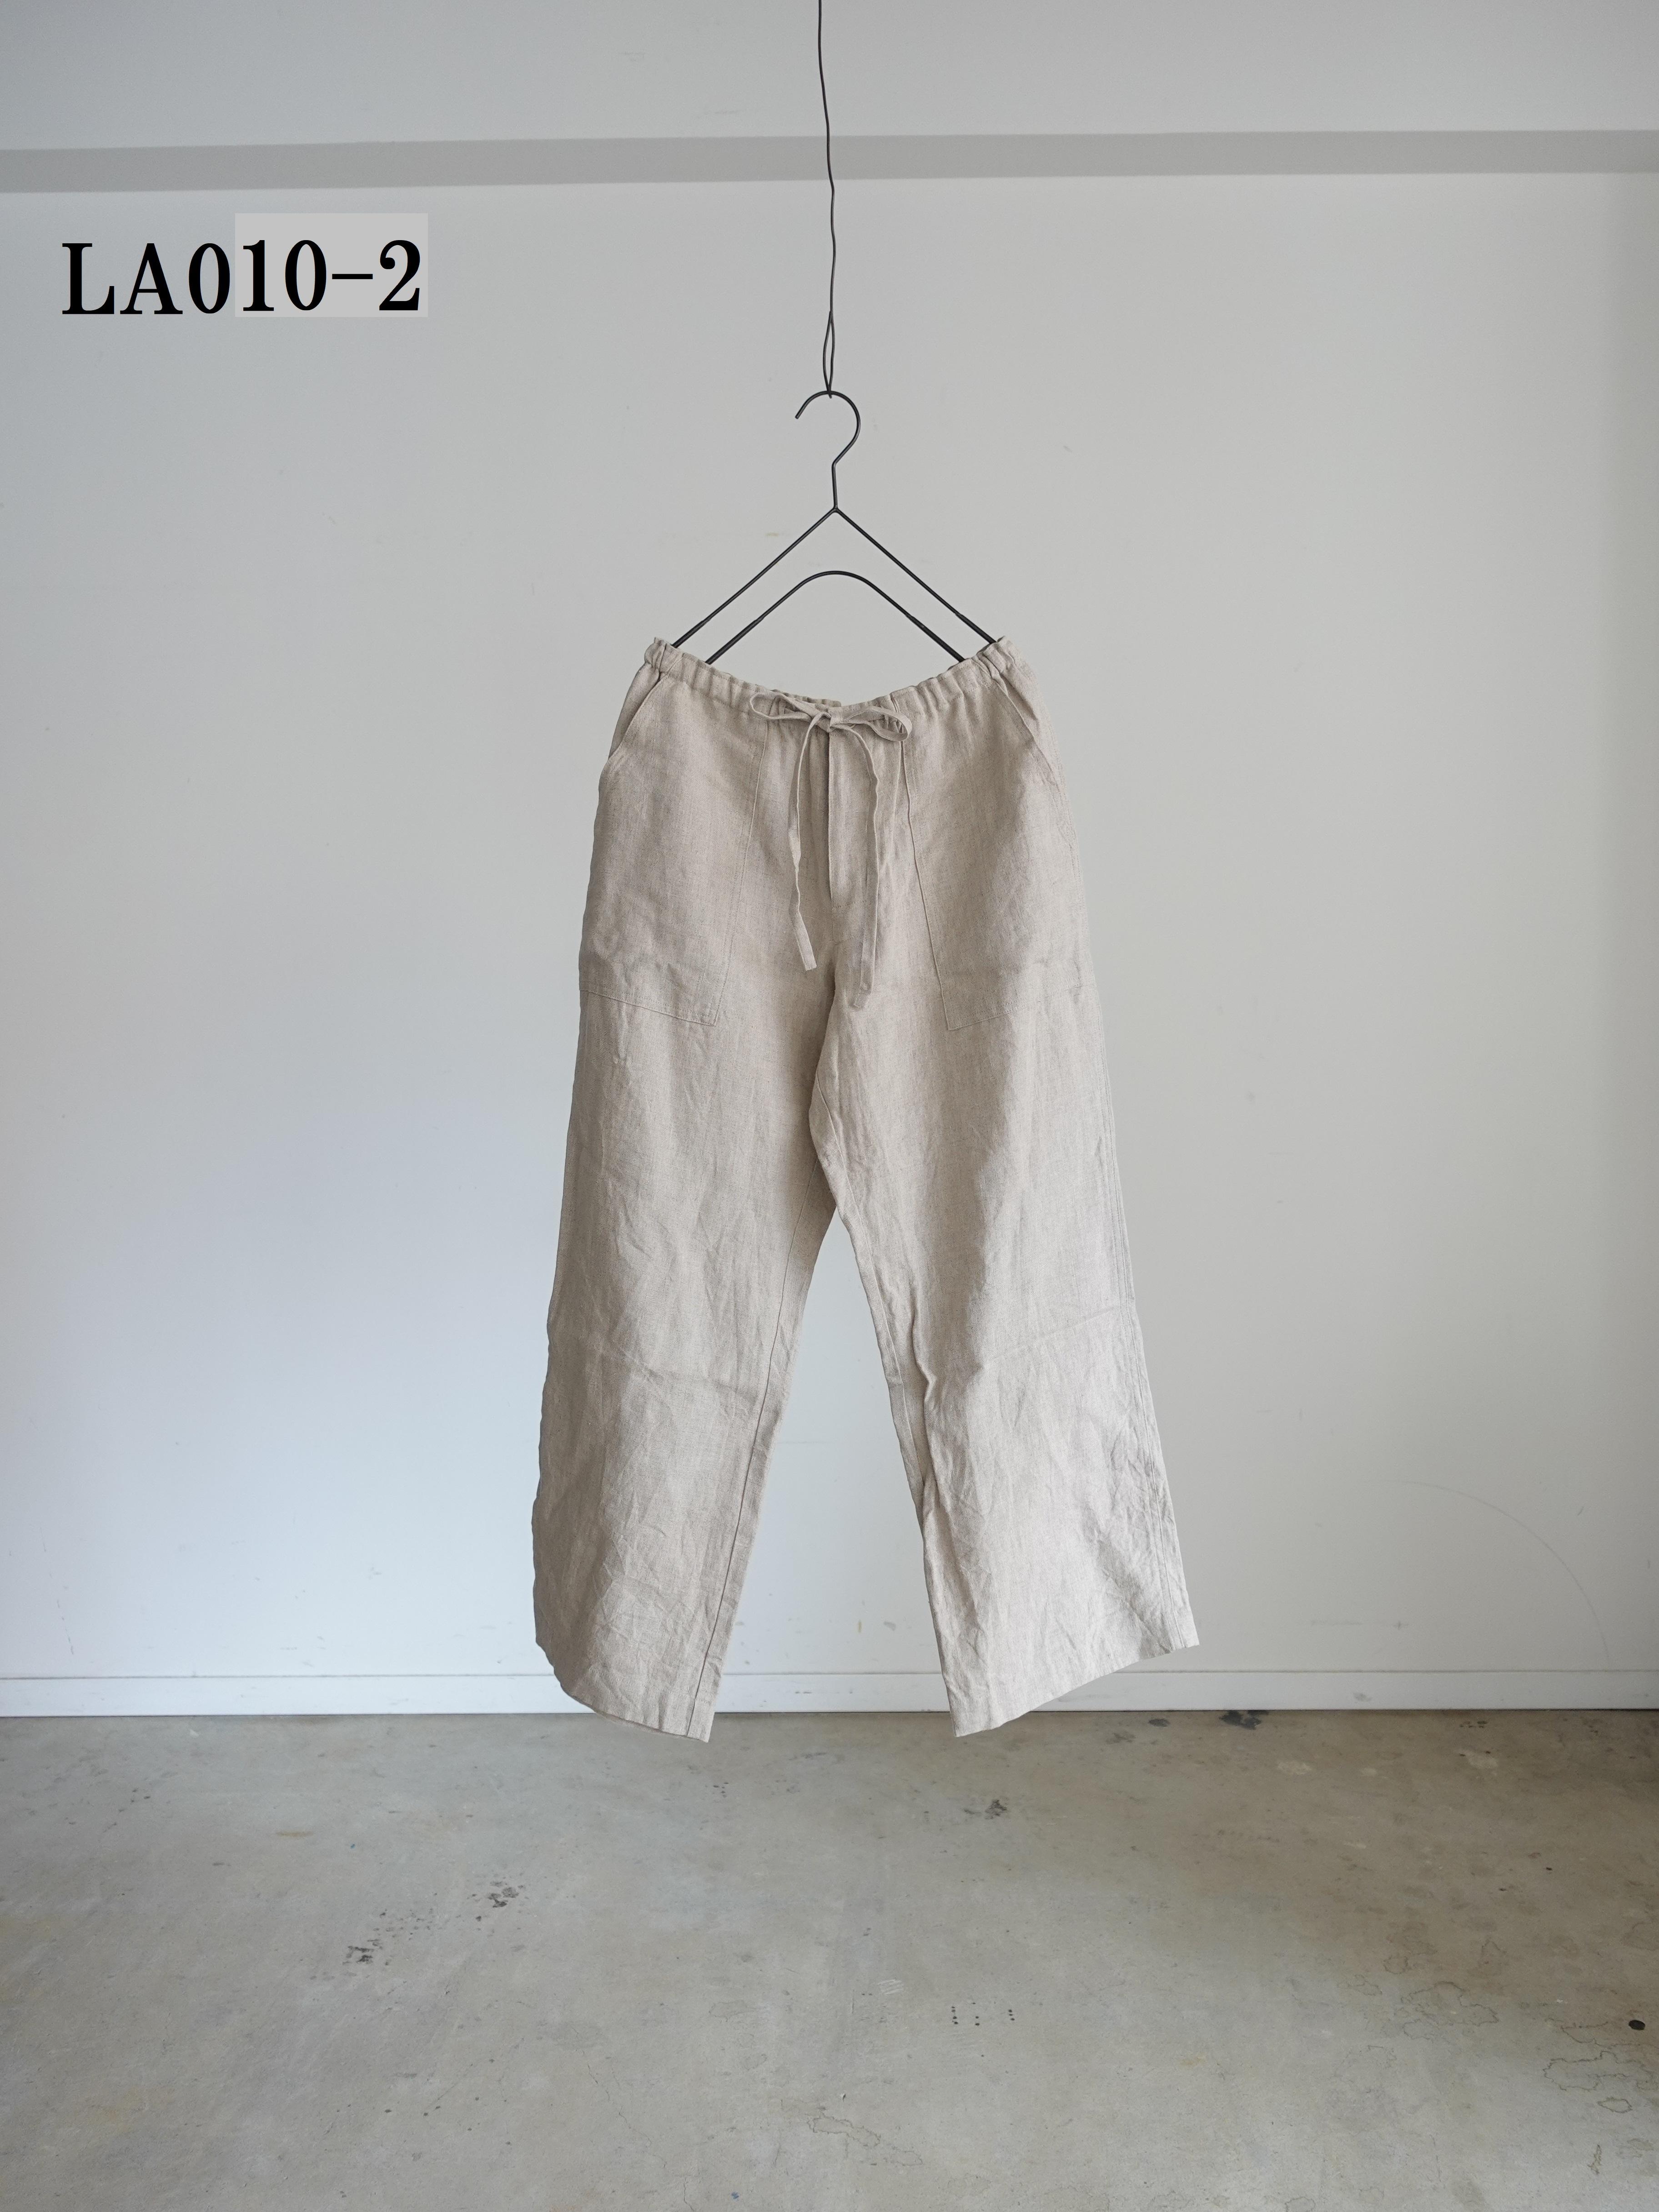 2LA010-2